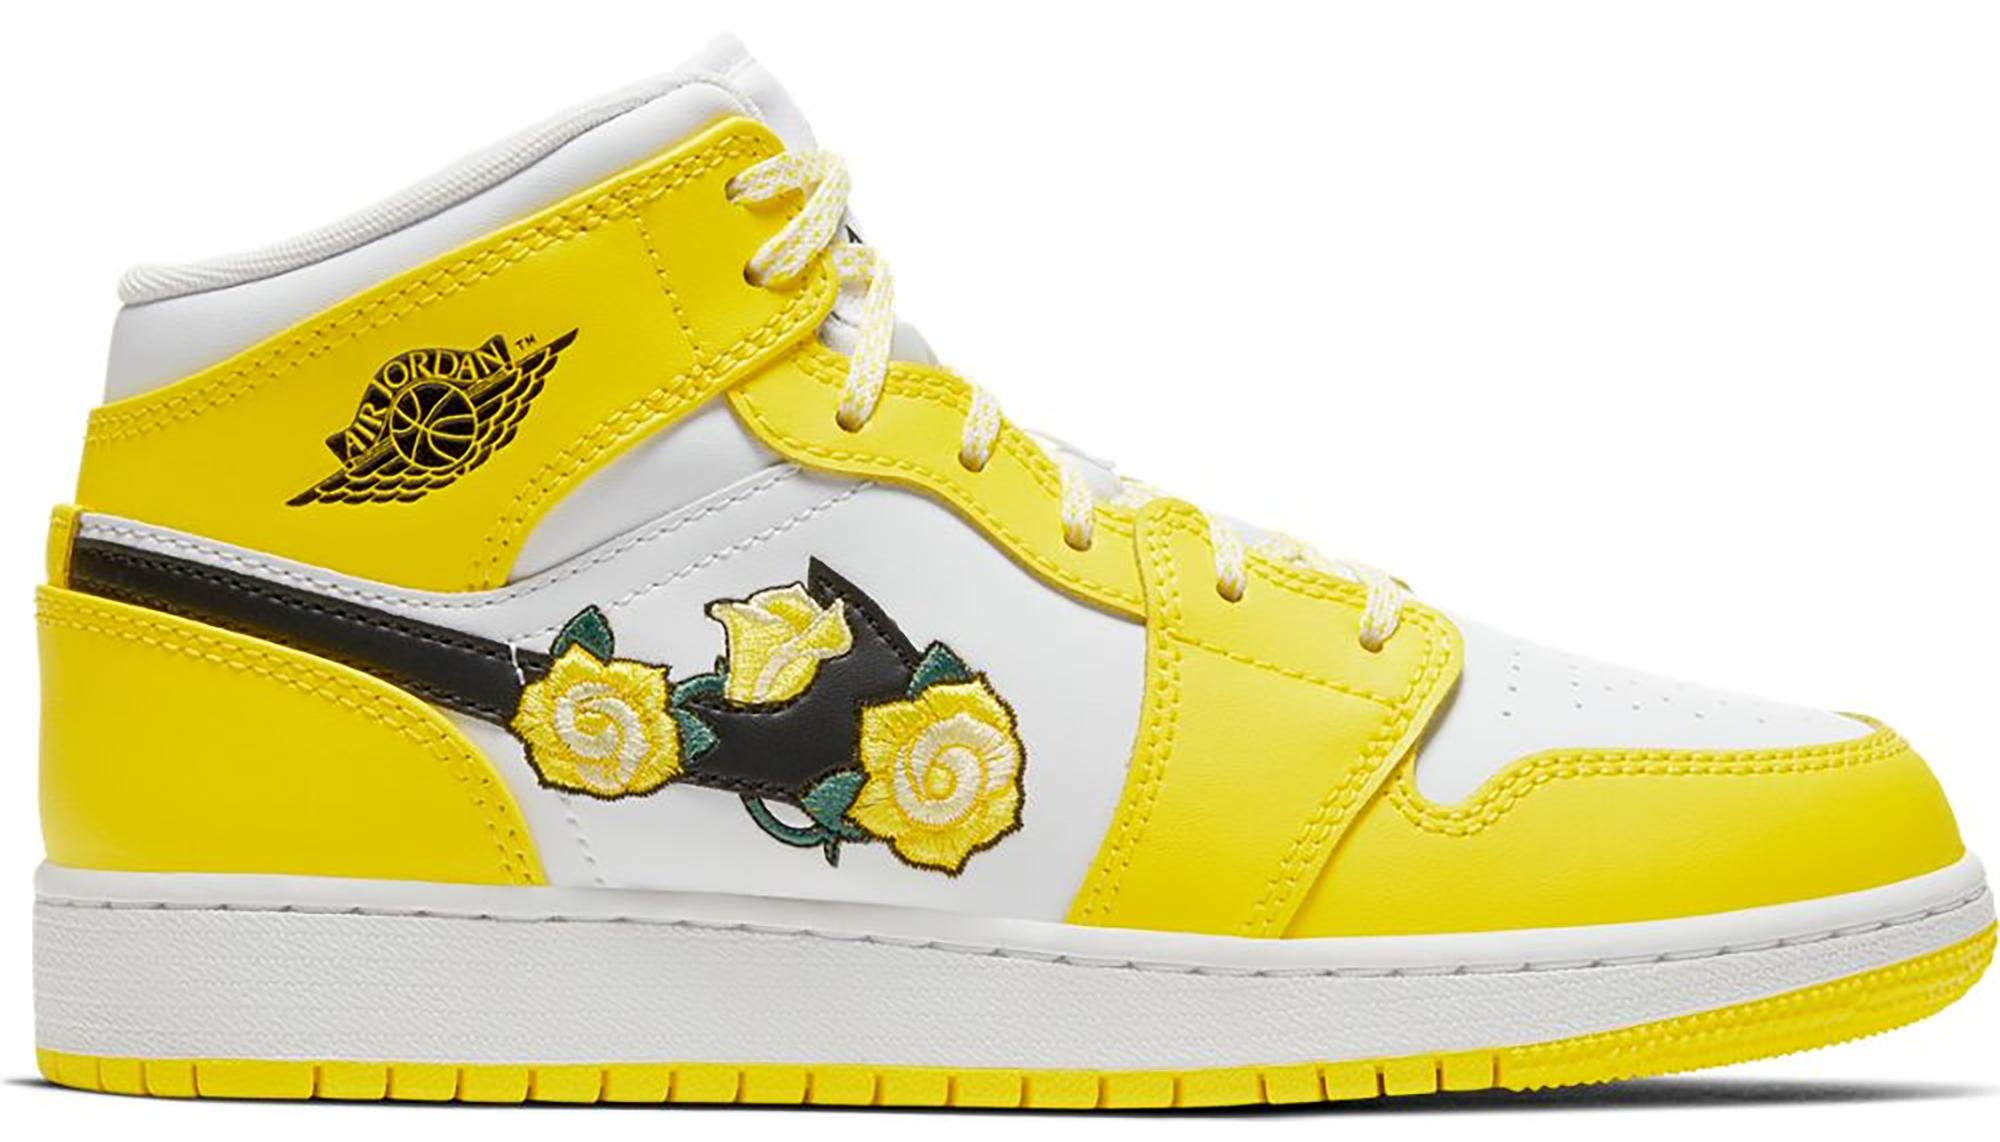 Jordan 1 Mid Dynamic Yellow Floral (GS